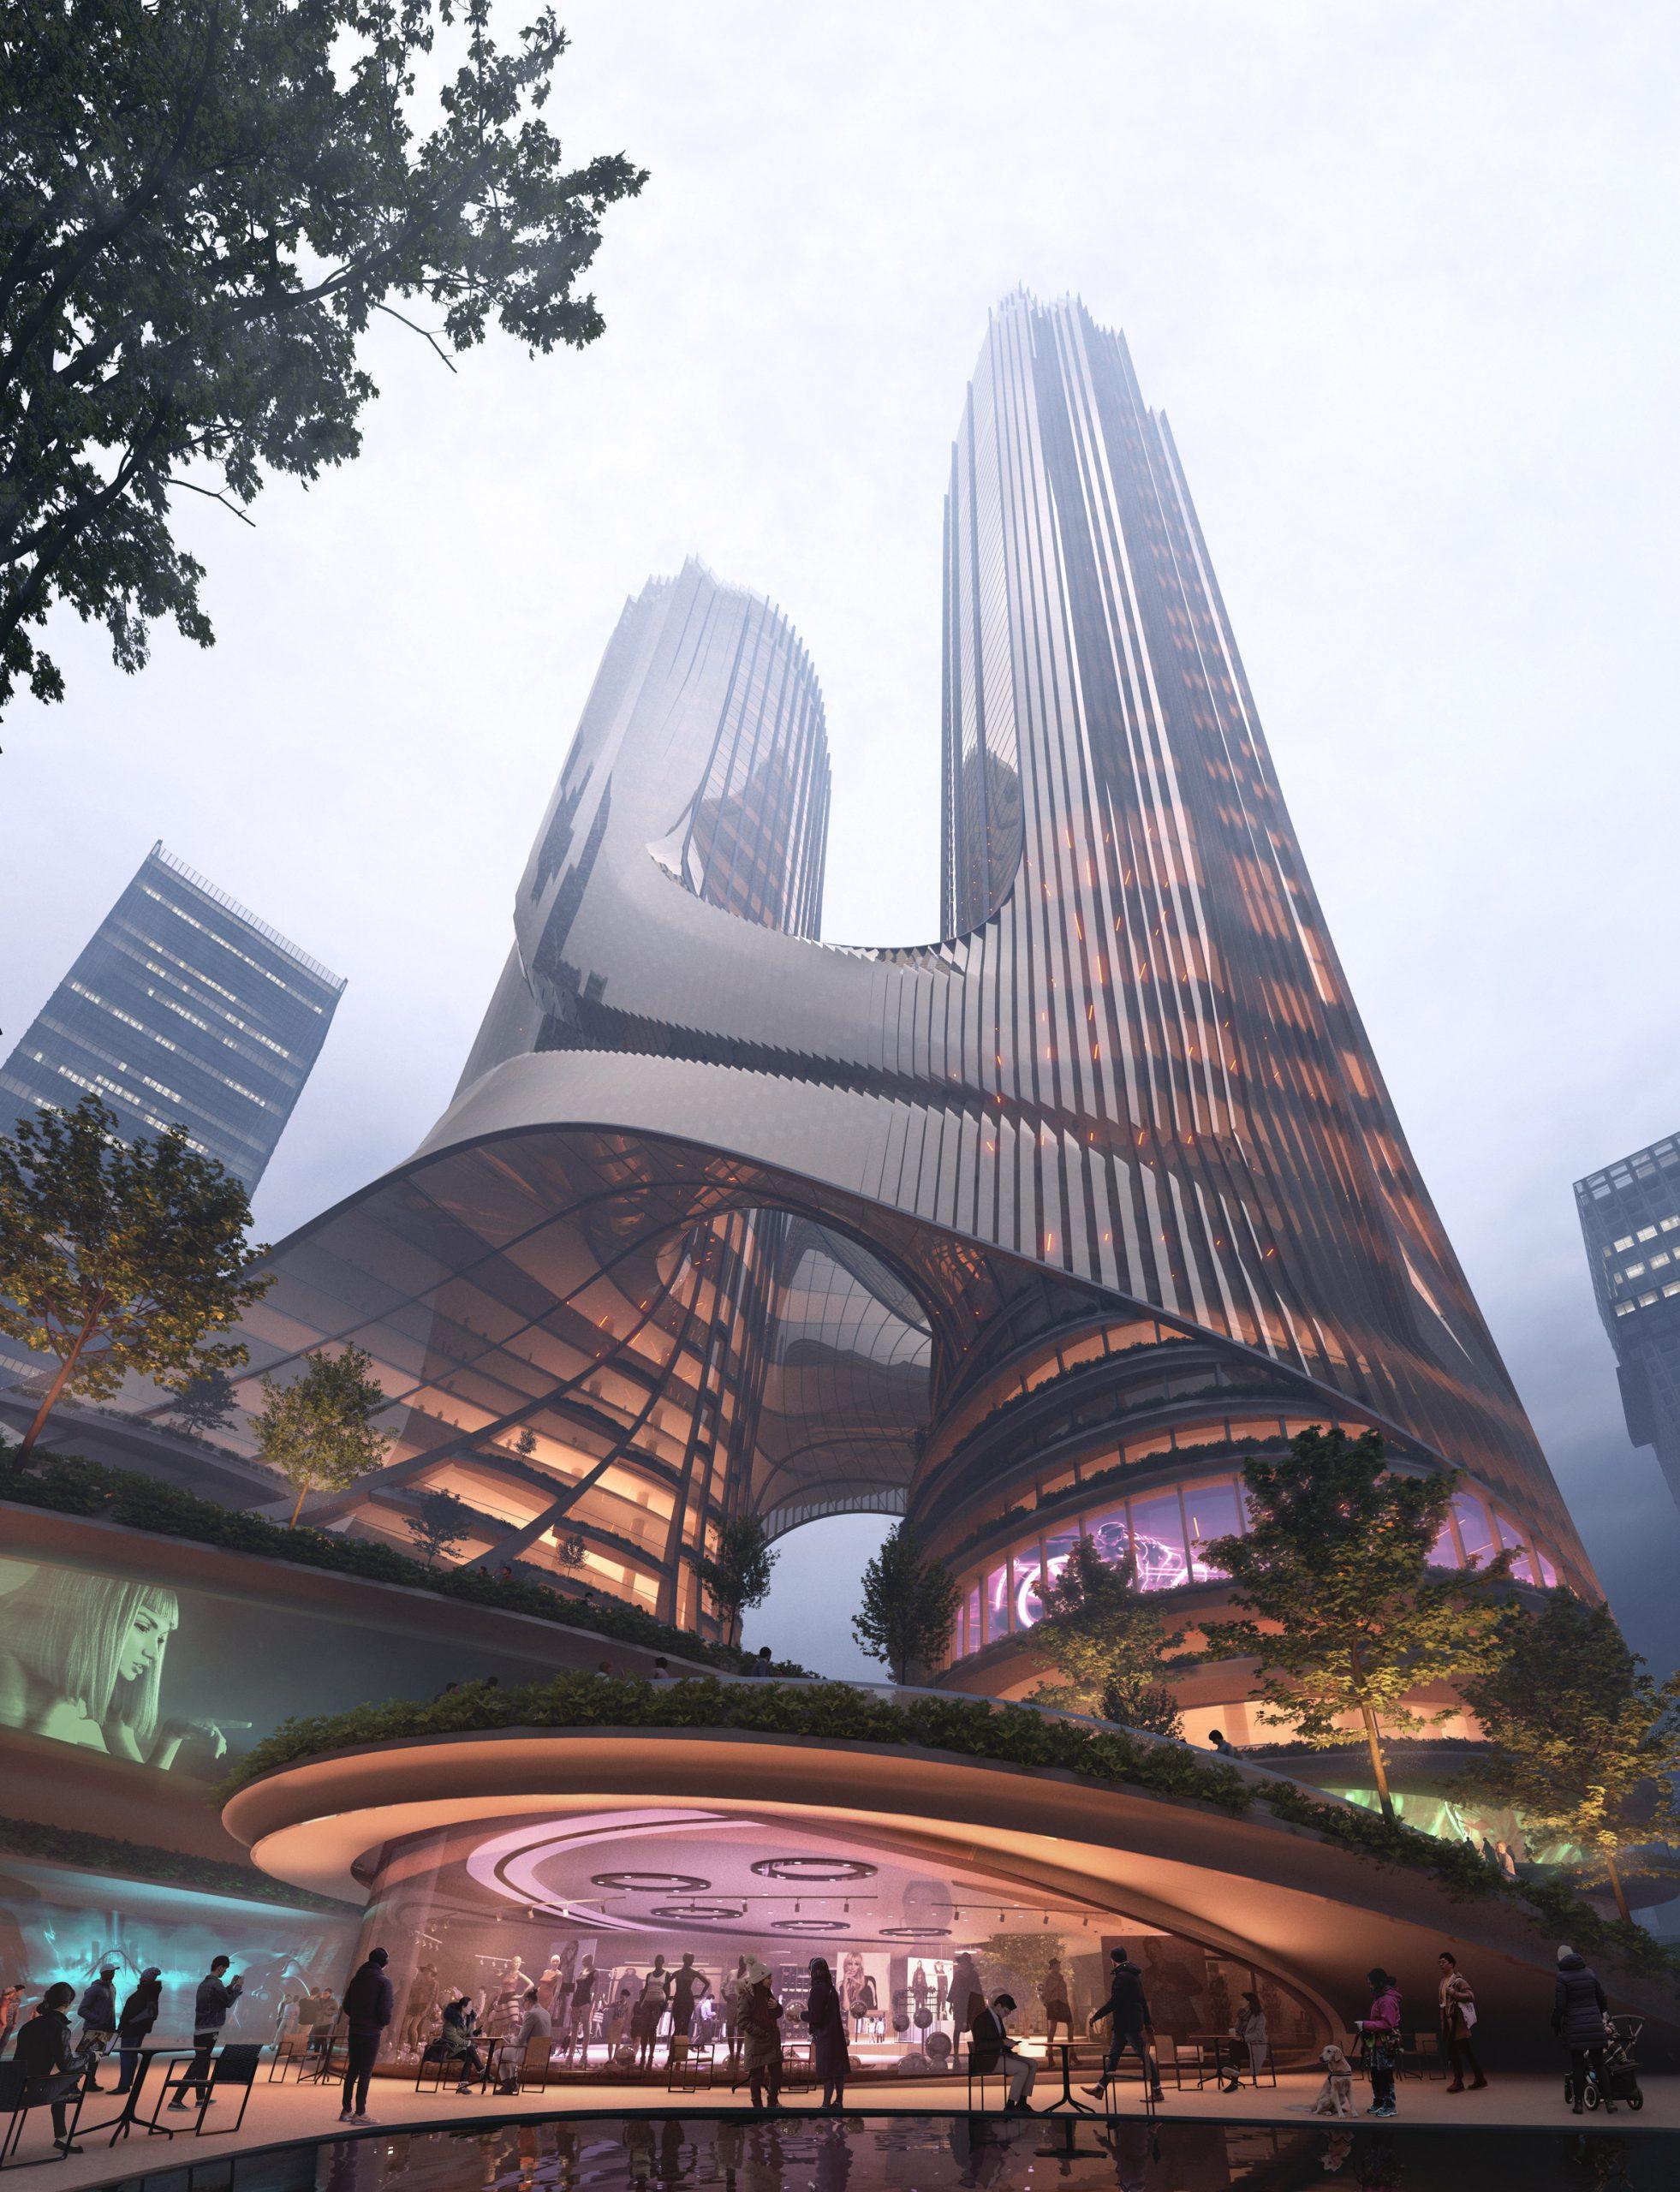 Bild: https://abload.de/img/tower-c-zaha-hadid-artkjjp.jpg